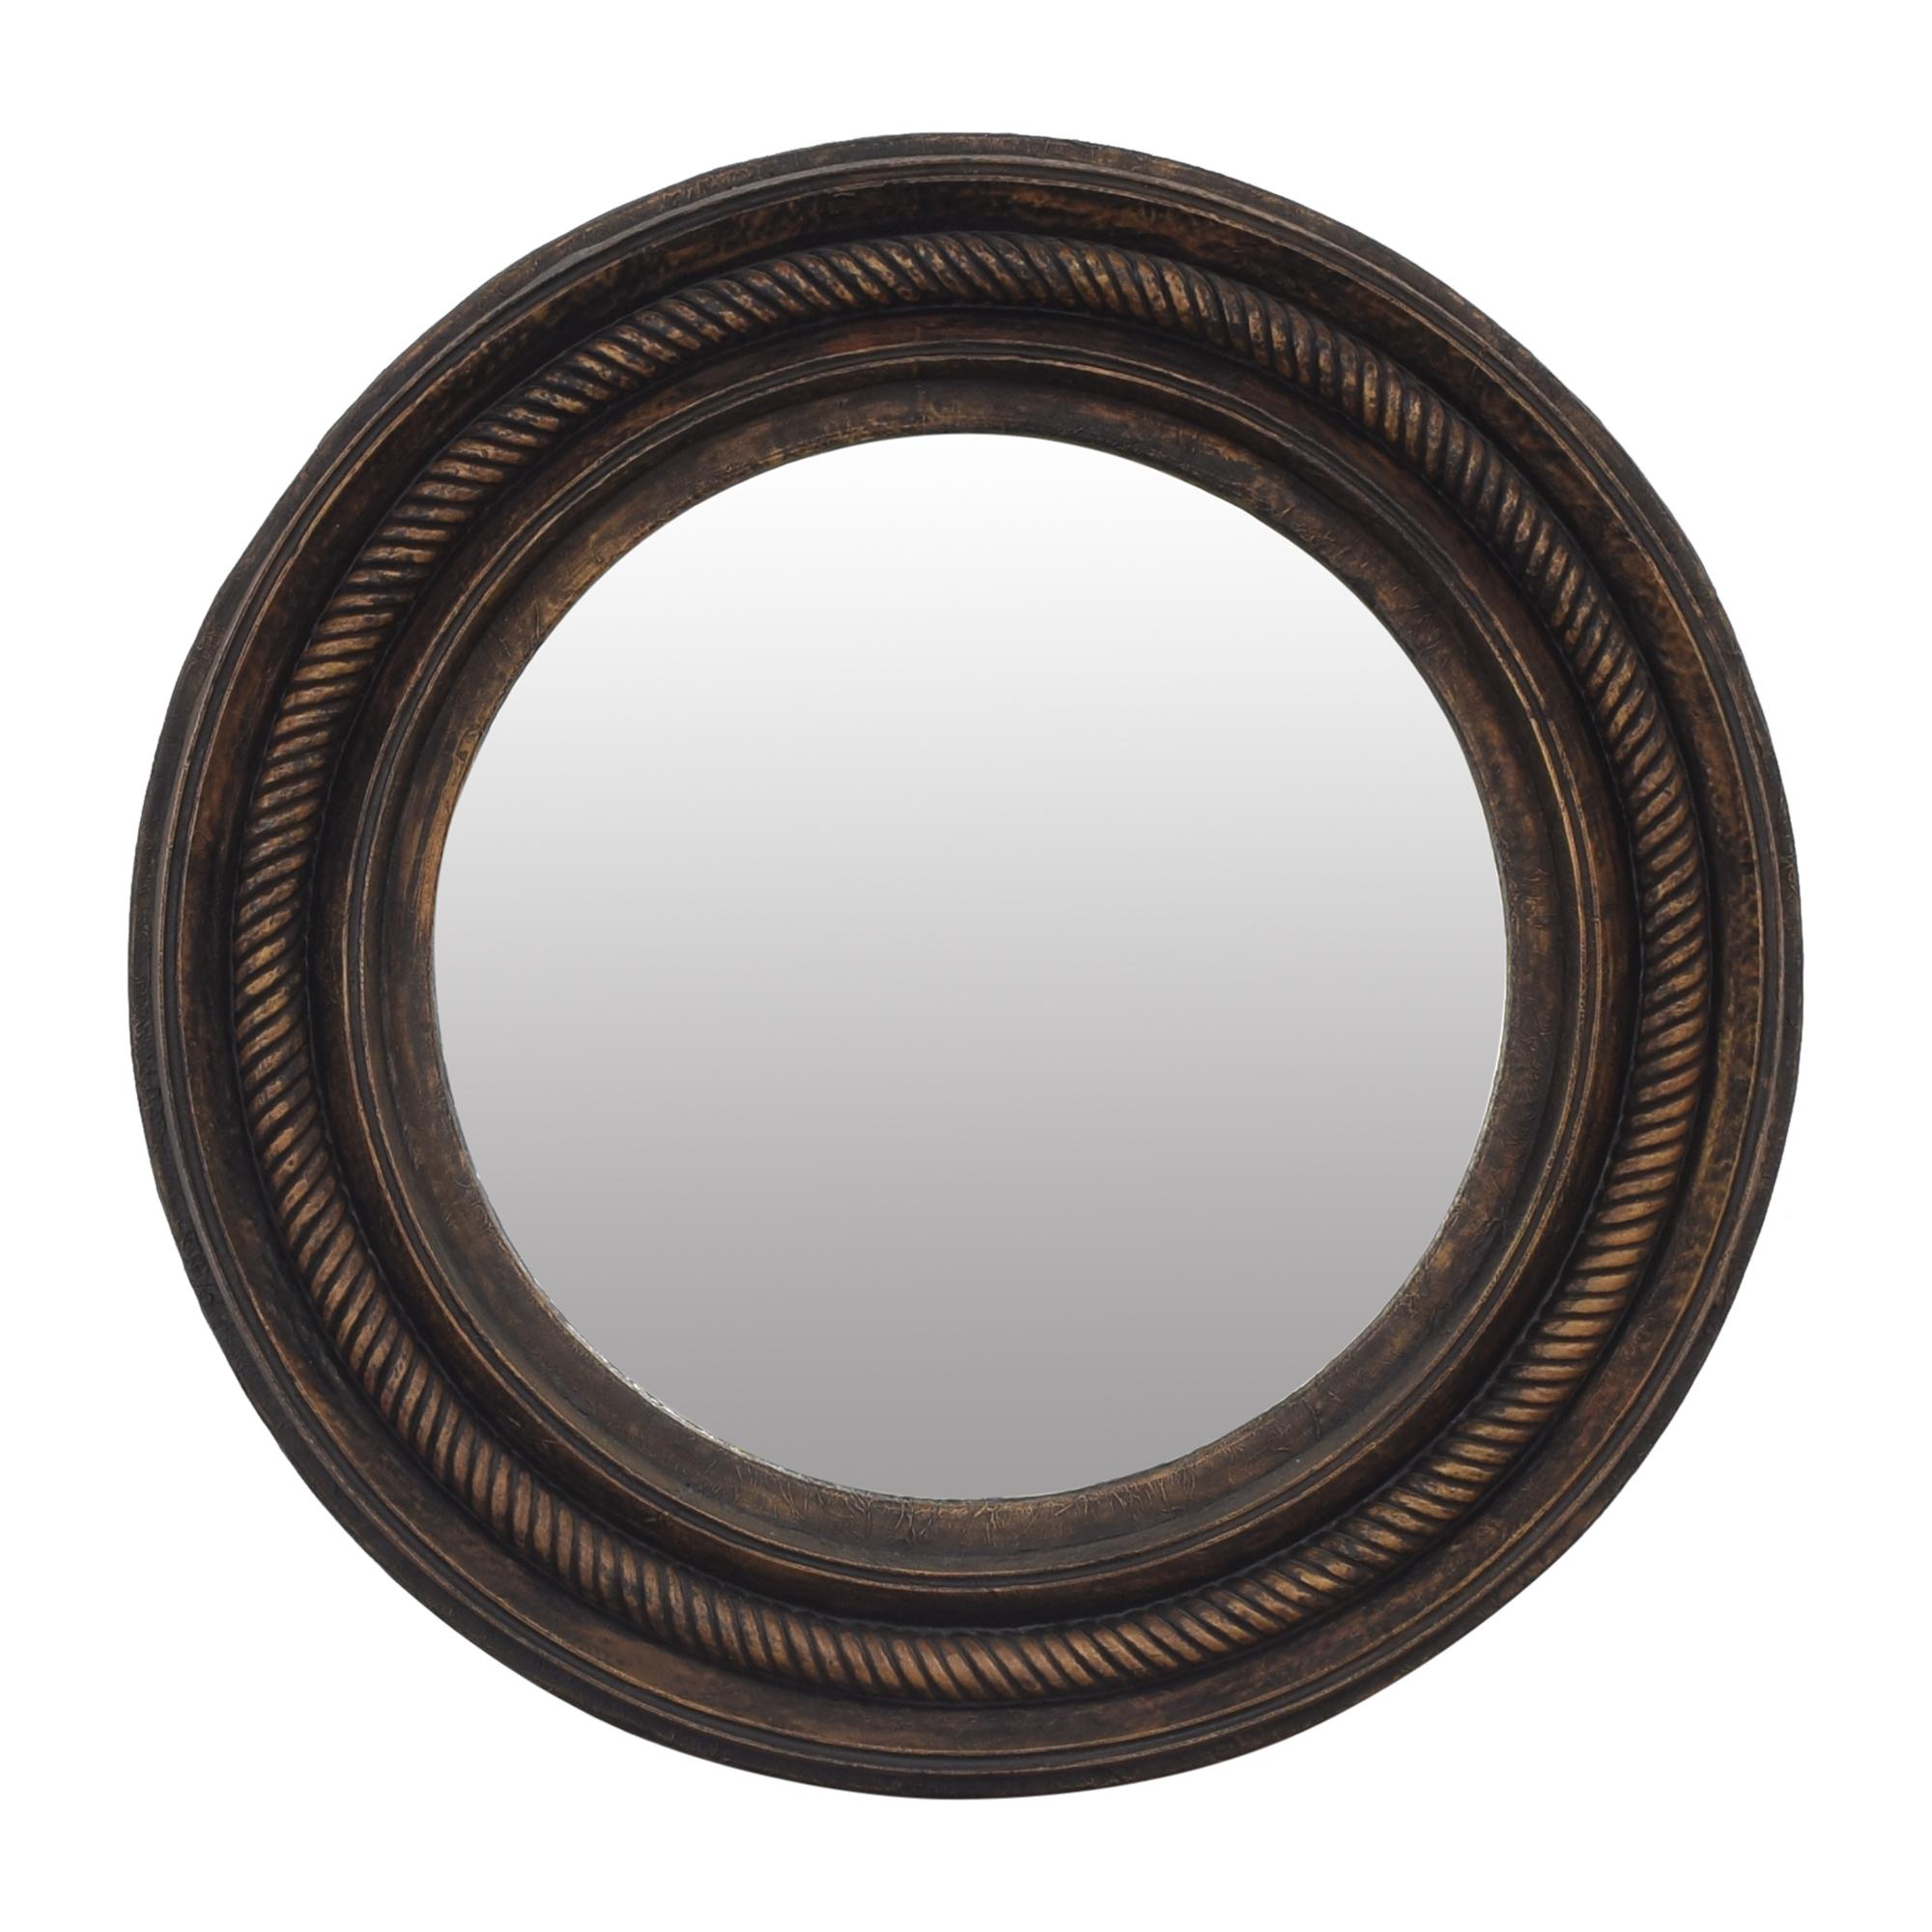 Neiman Marcus Neiman Marcus Round Wall Mirror used